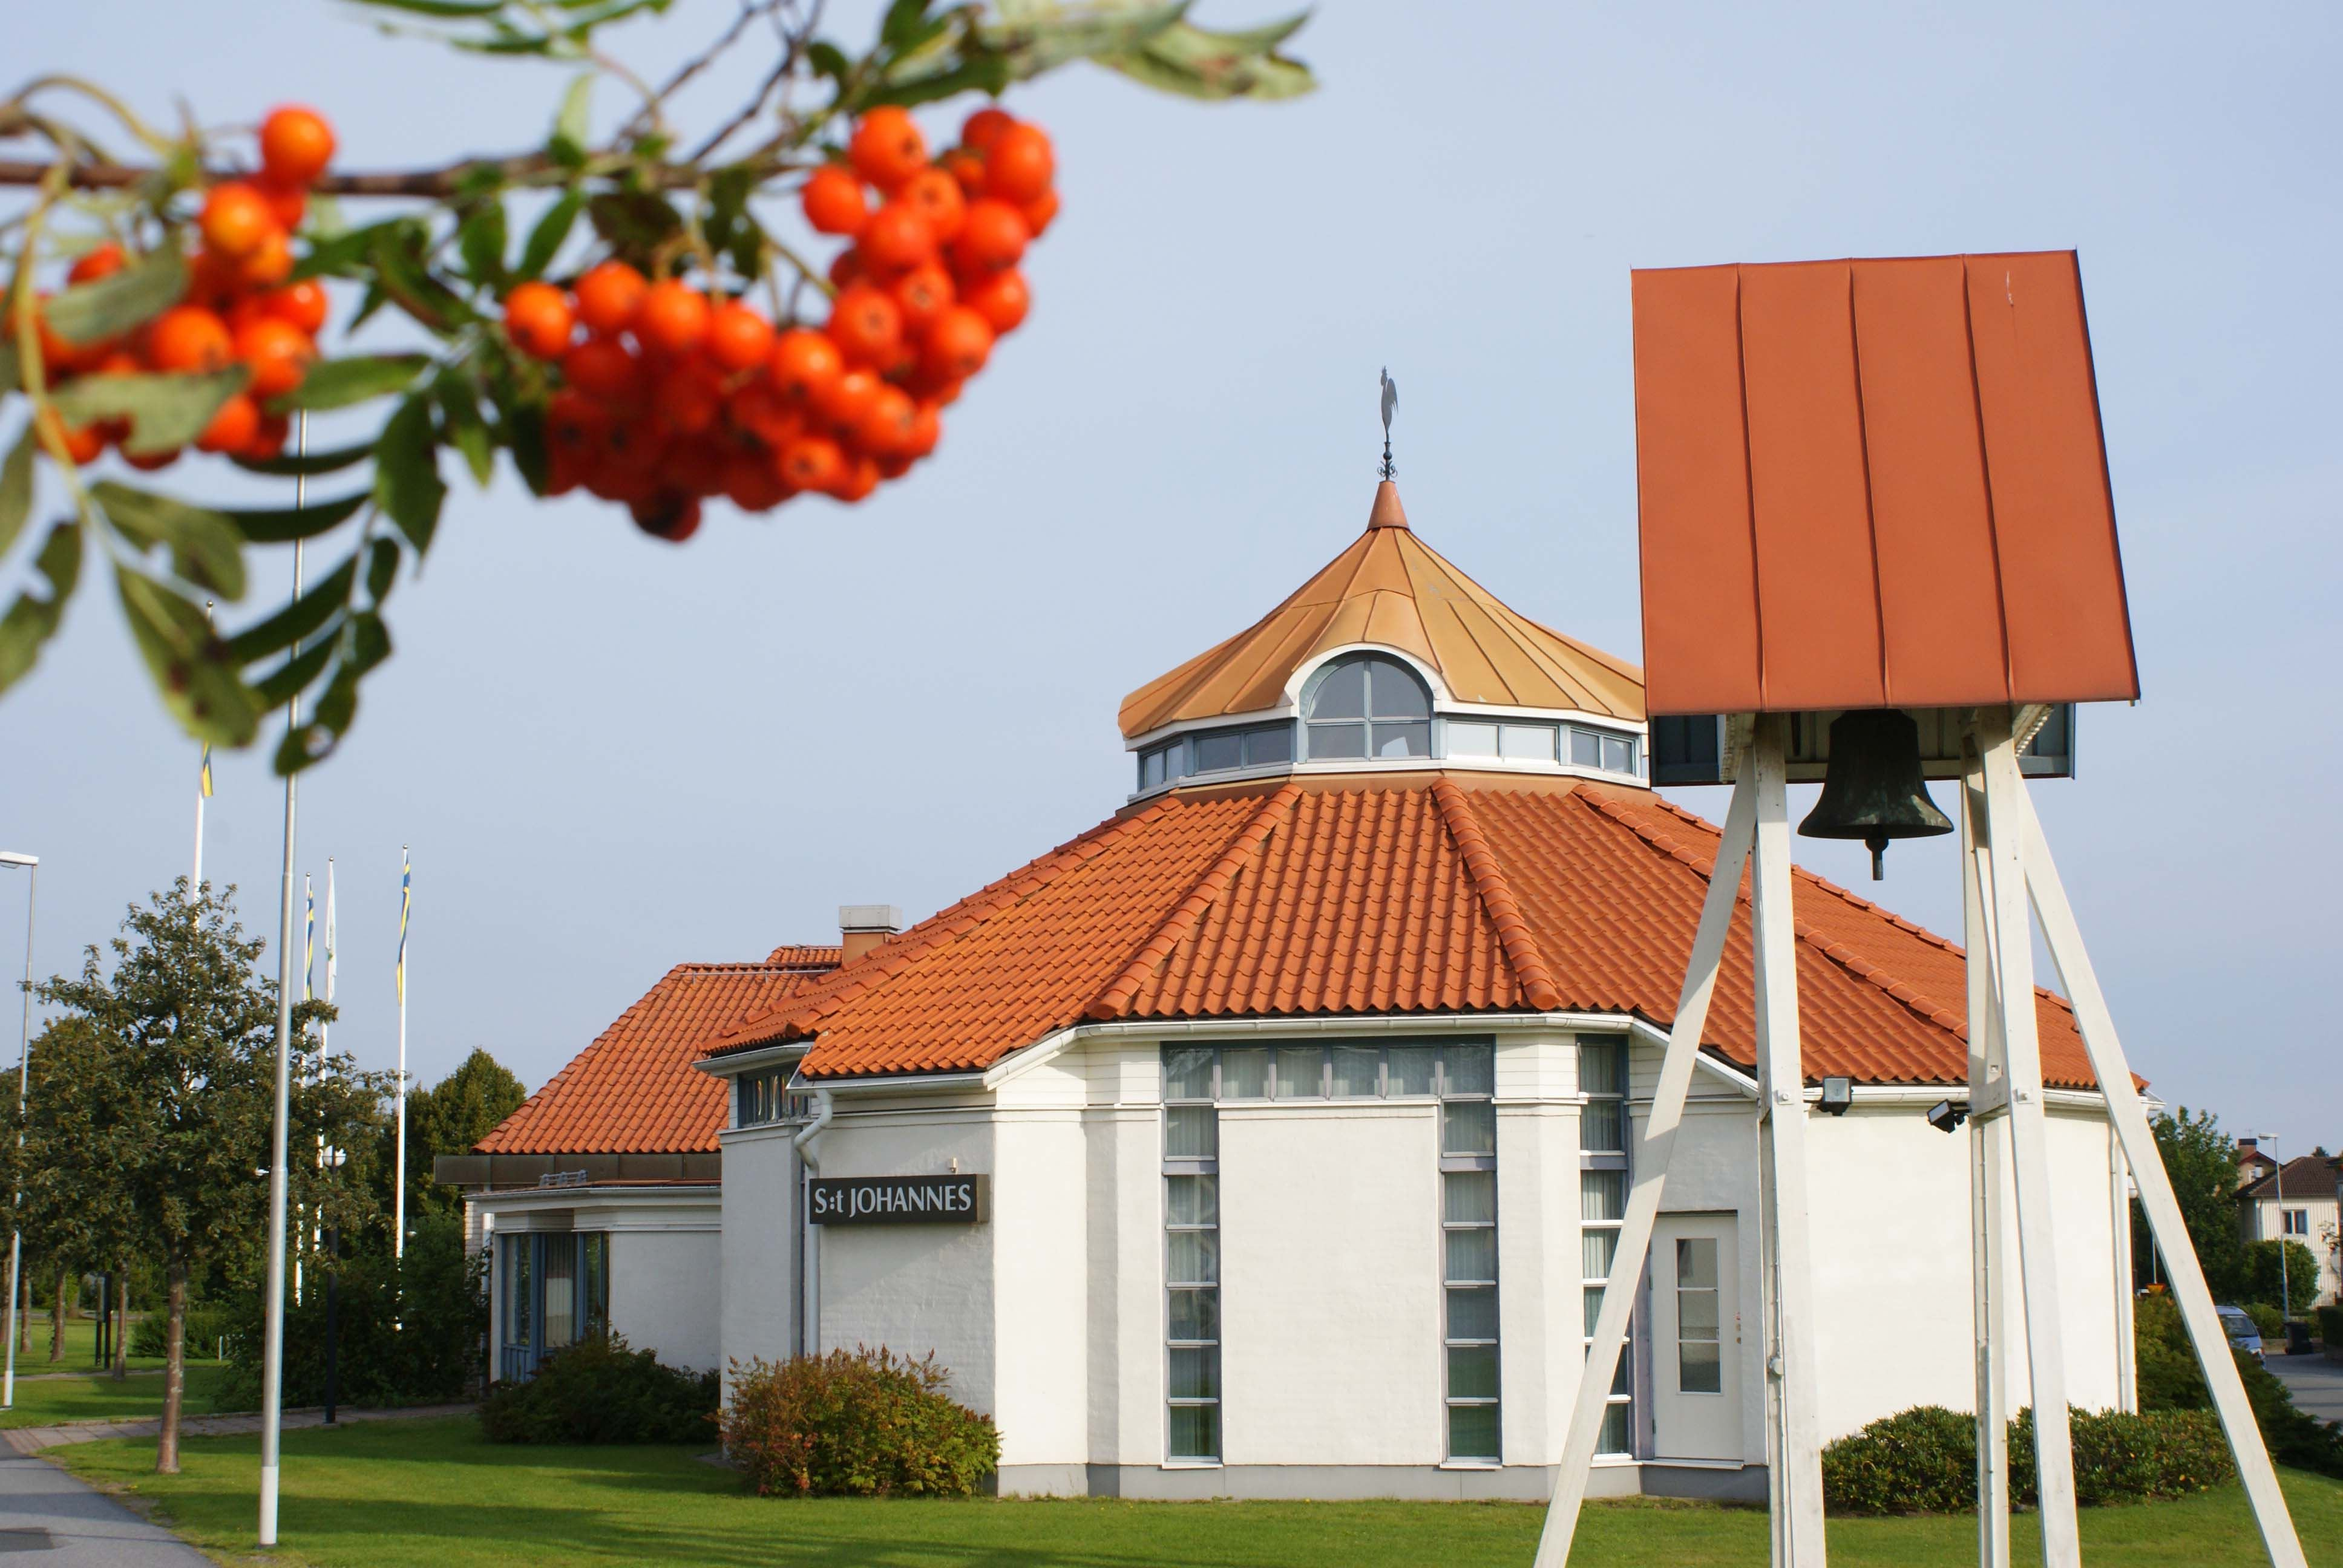 Öppet hus i S:t Johannes